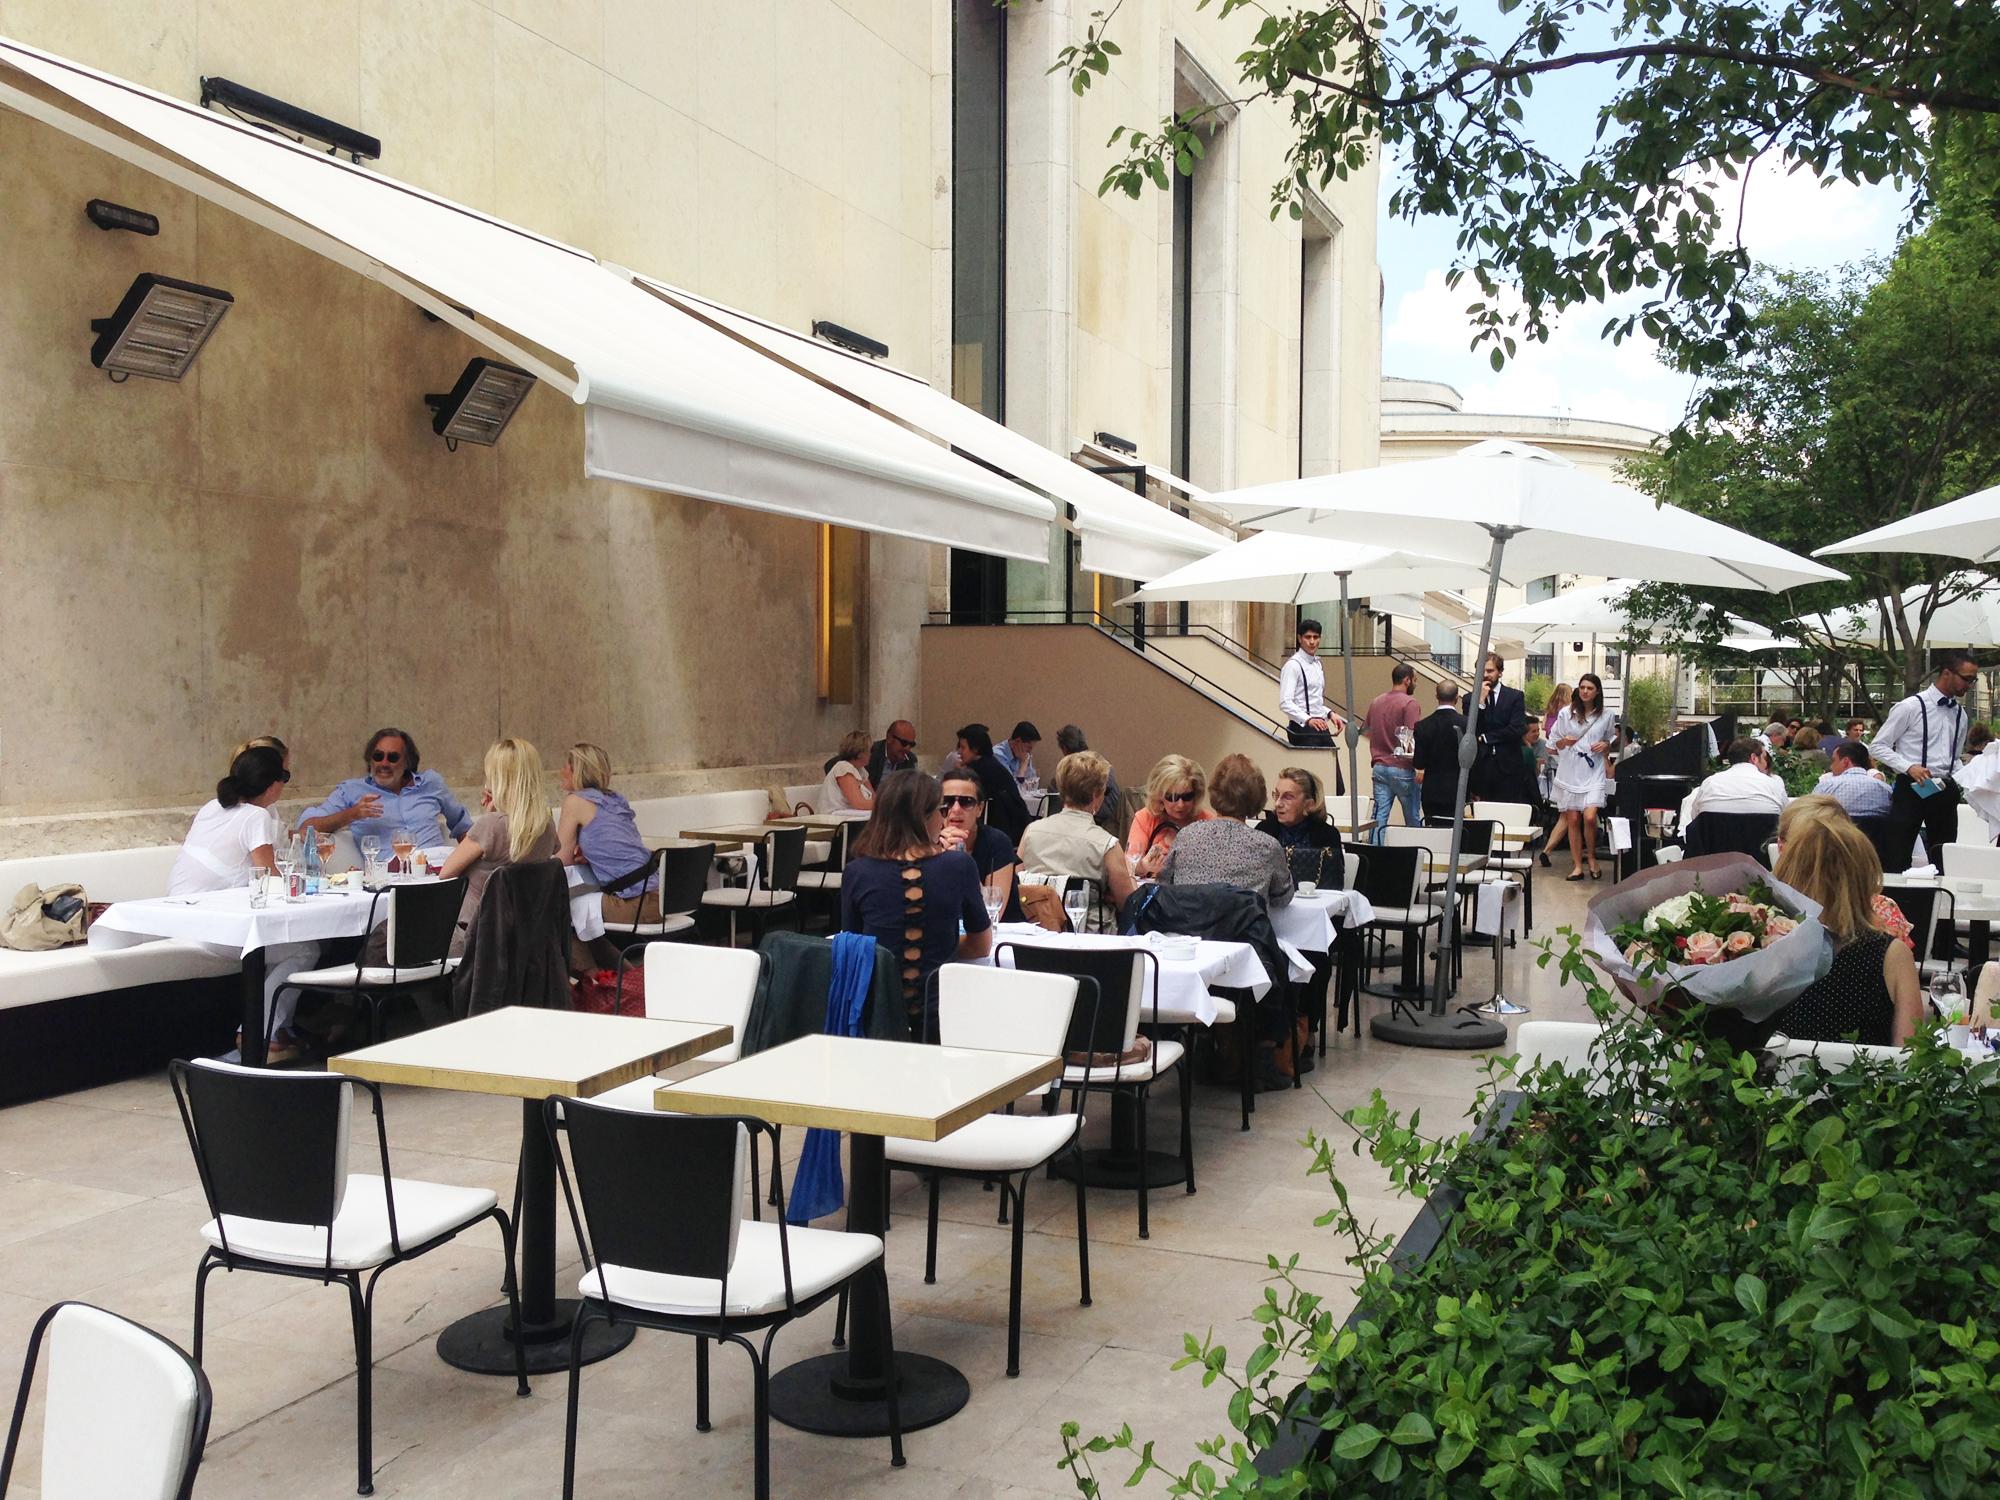 Restaurant  Ef Bf Bd Cot Ef Bf Bd De Chez Moi